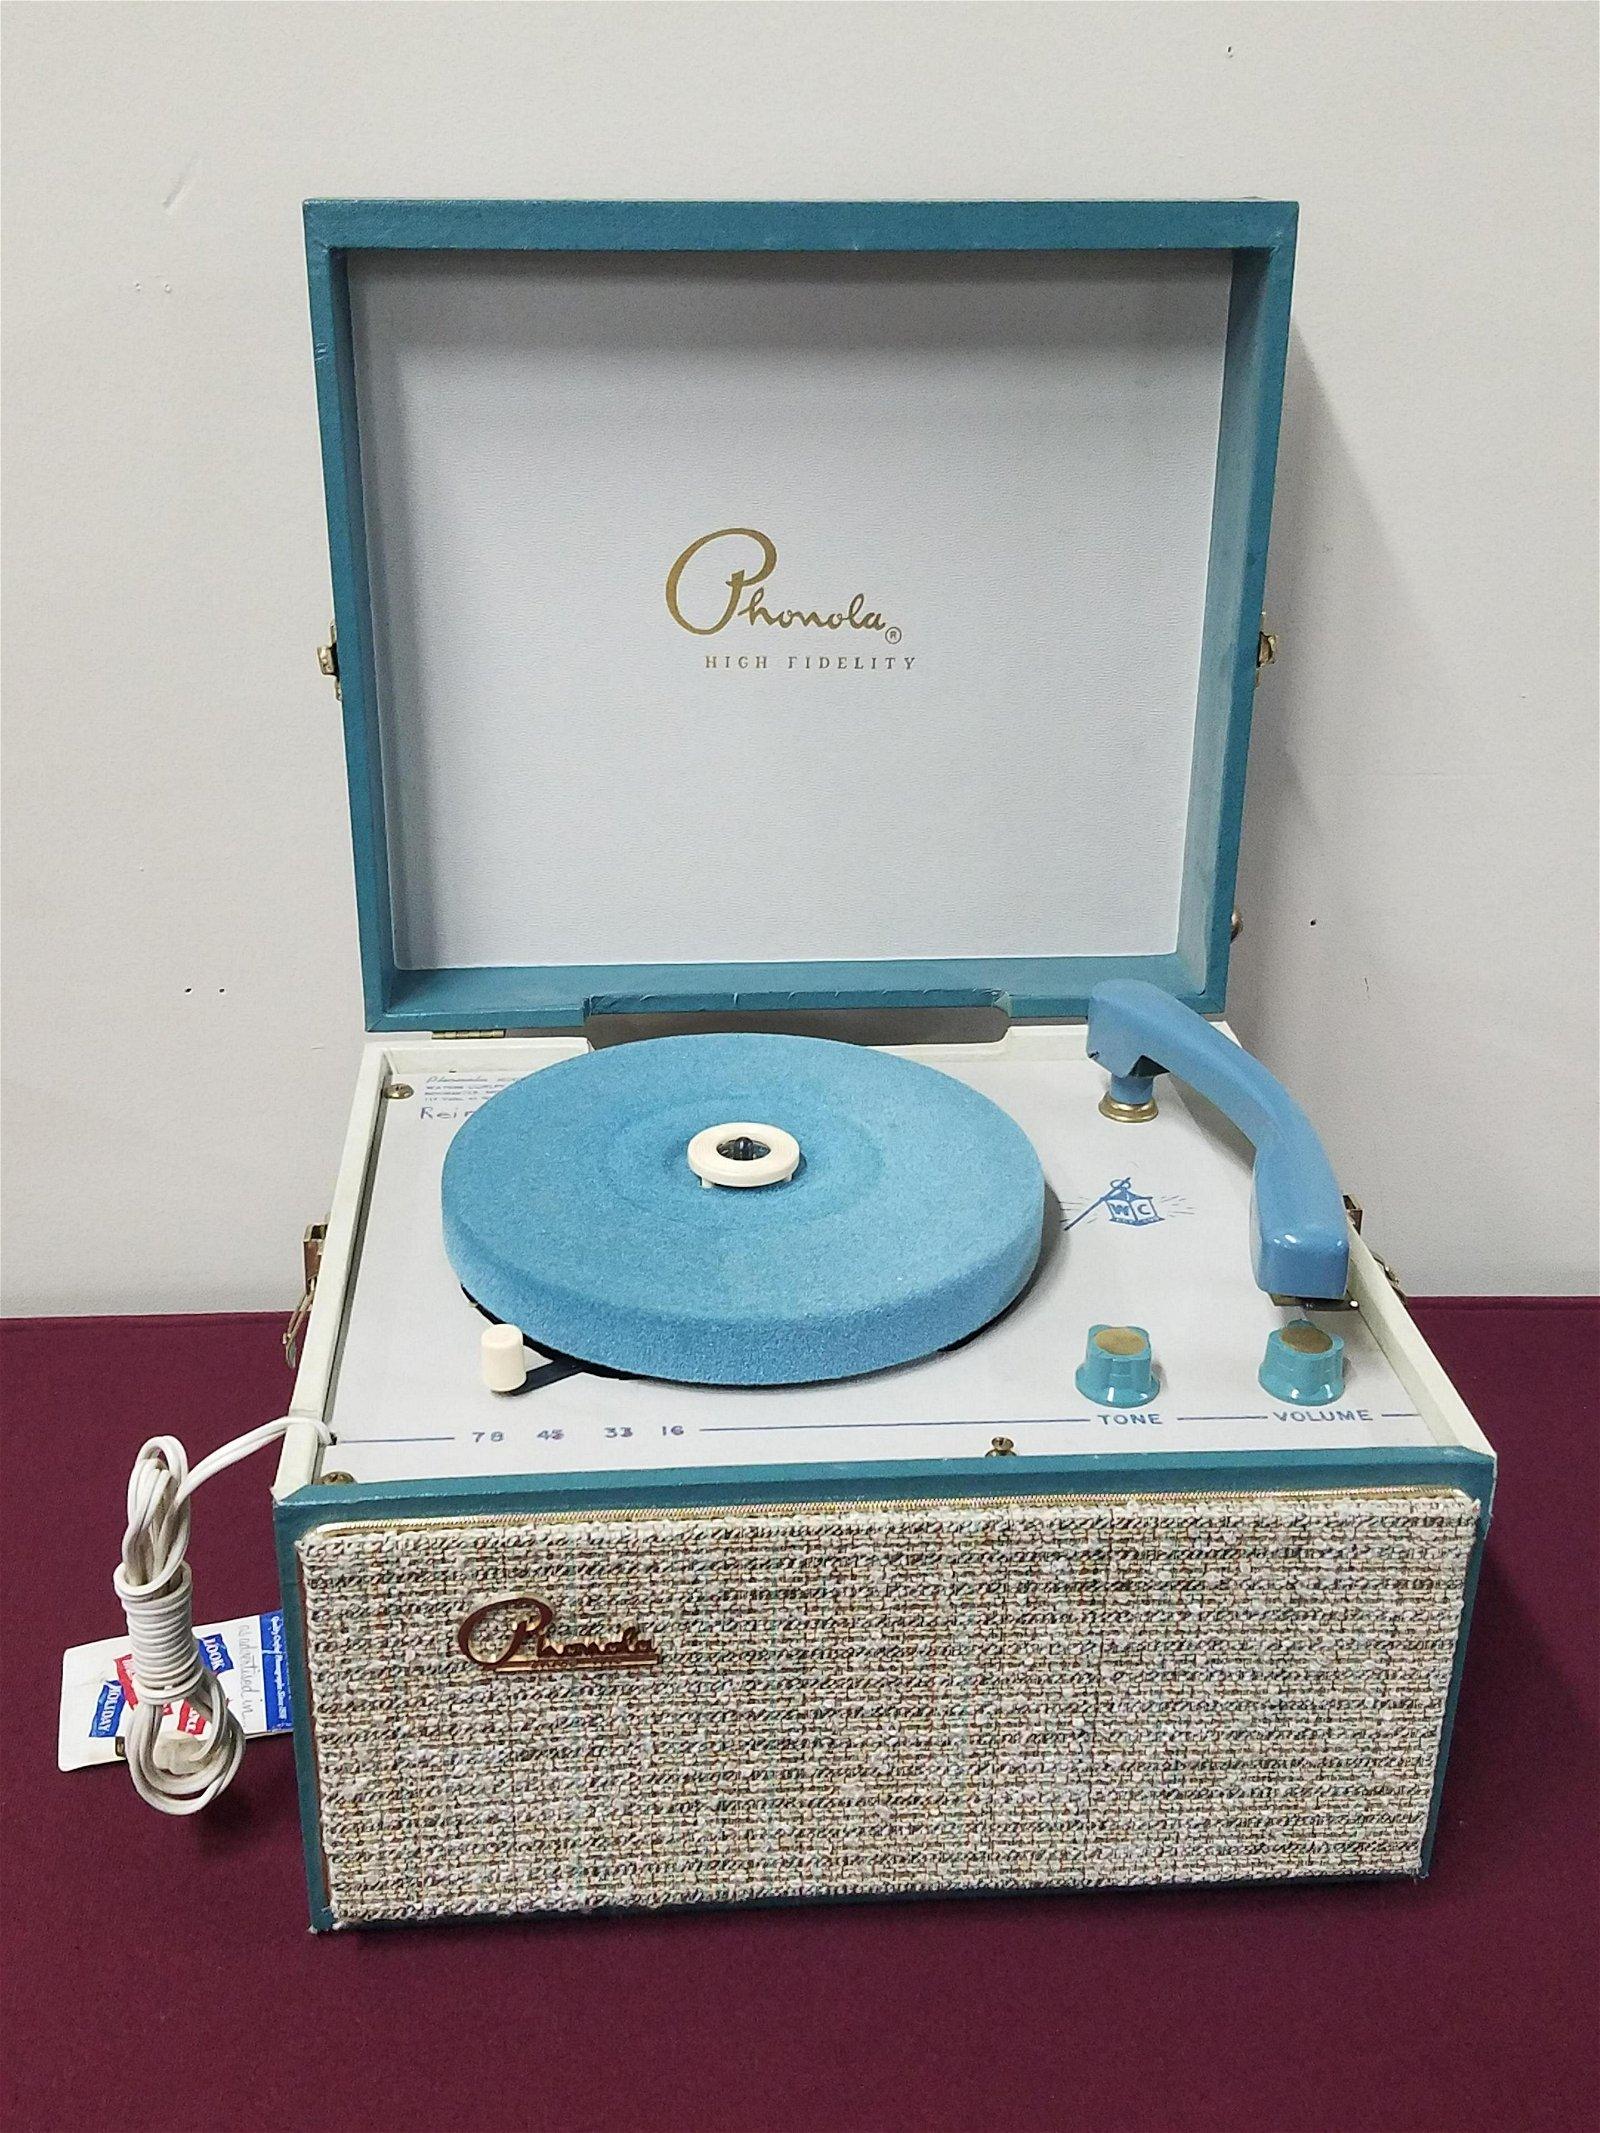 Phonola Record Player